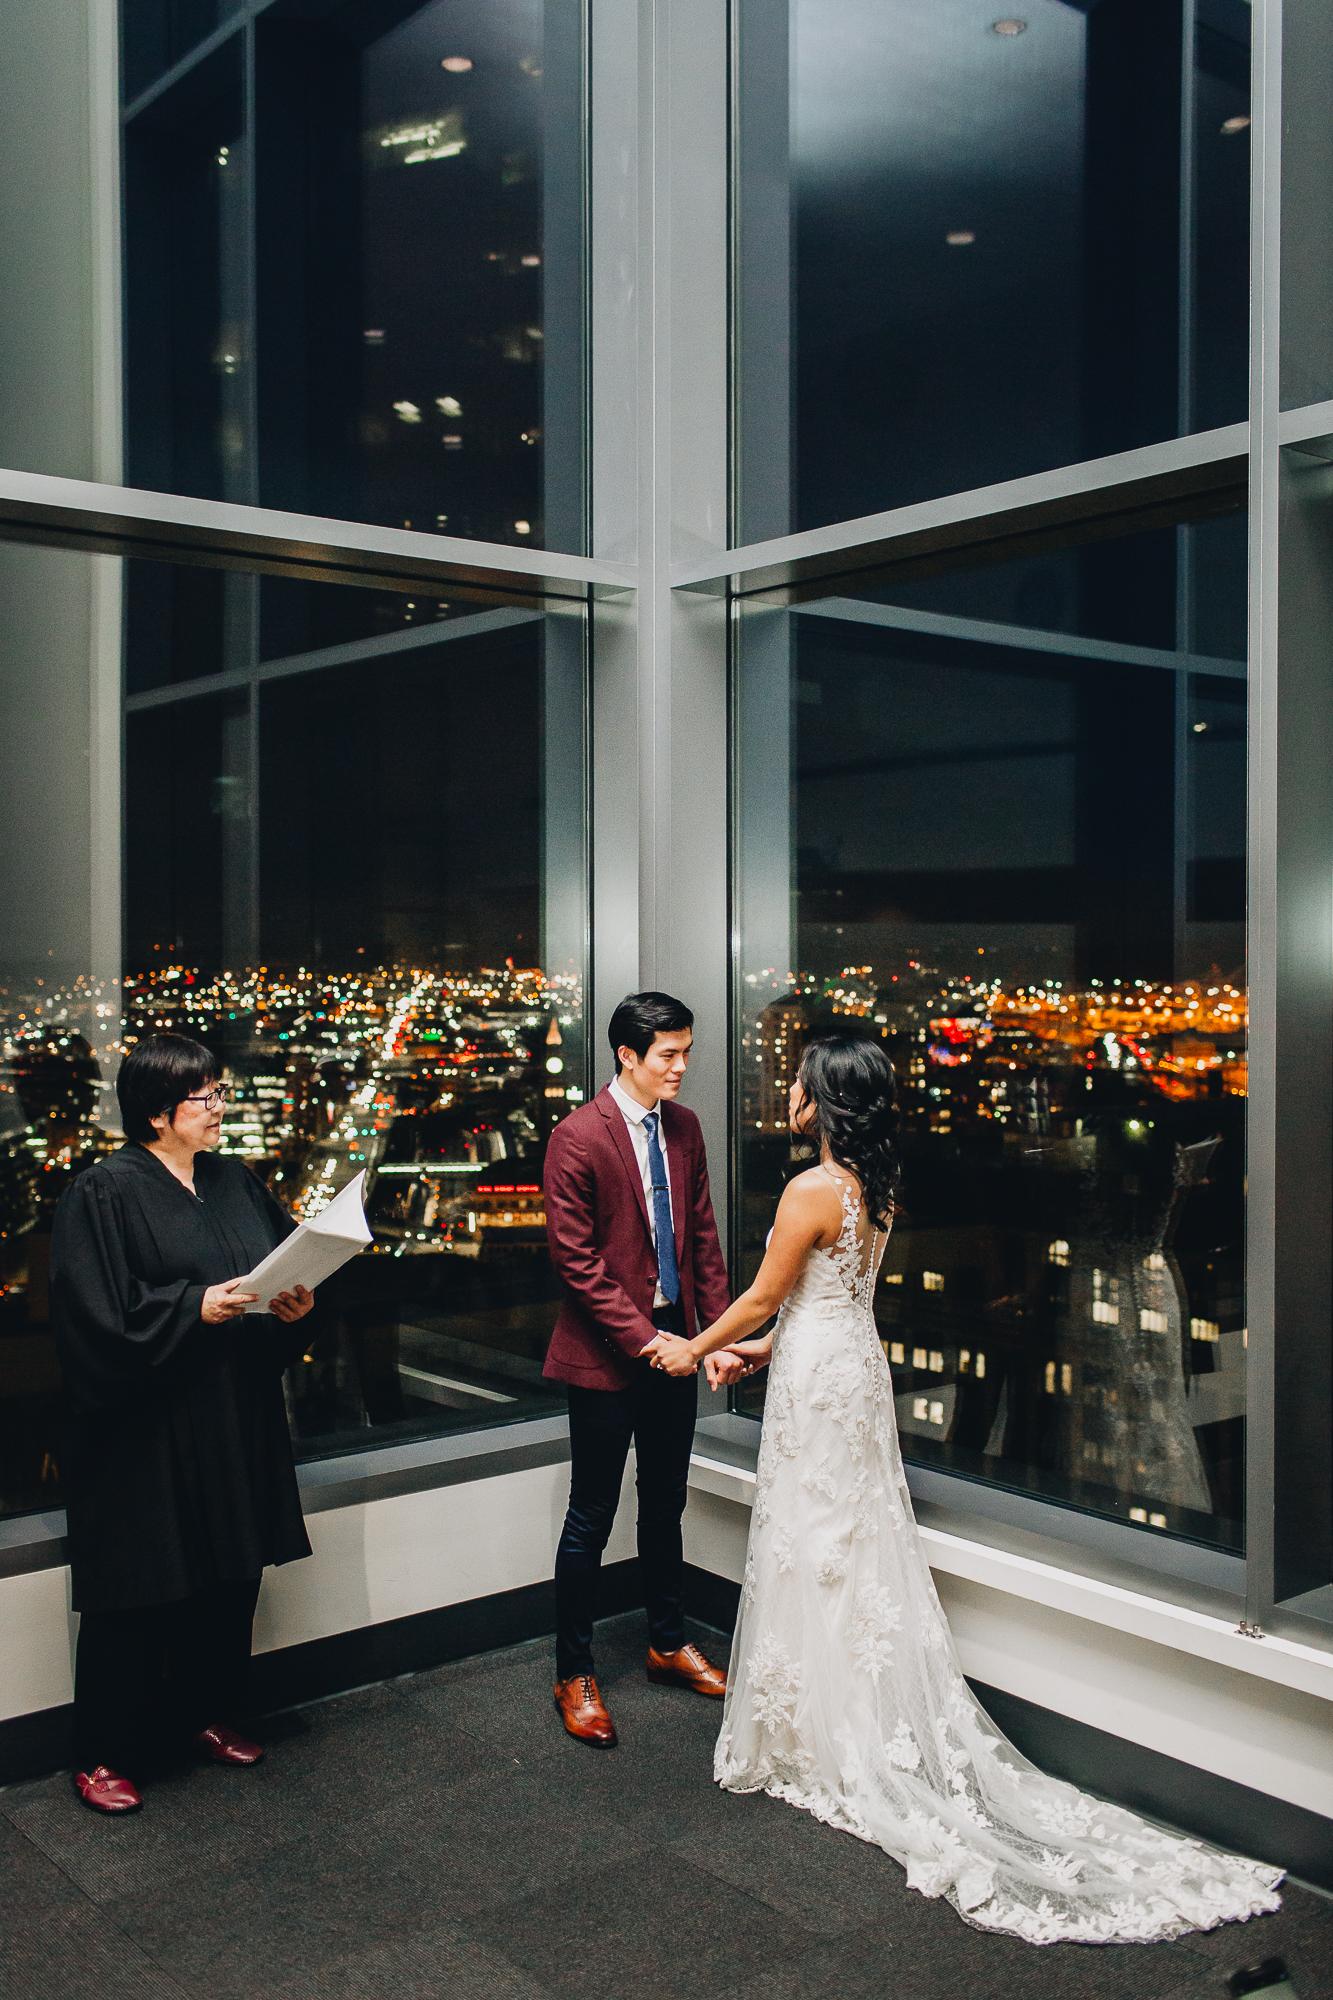 Seattle courthouse wedding photos kristawelch59.jpg